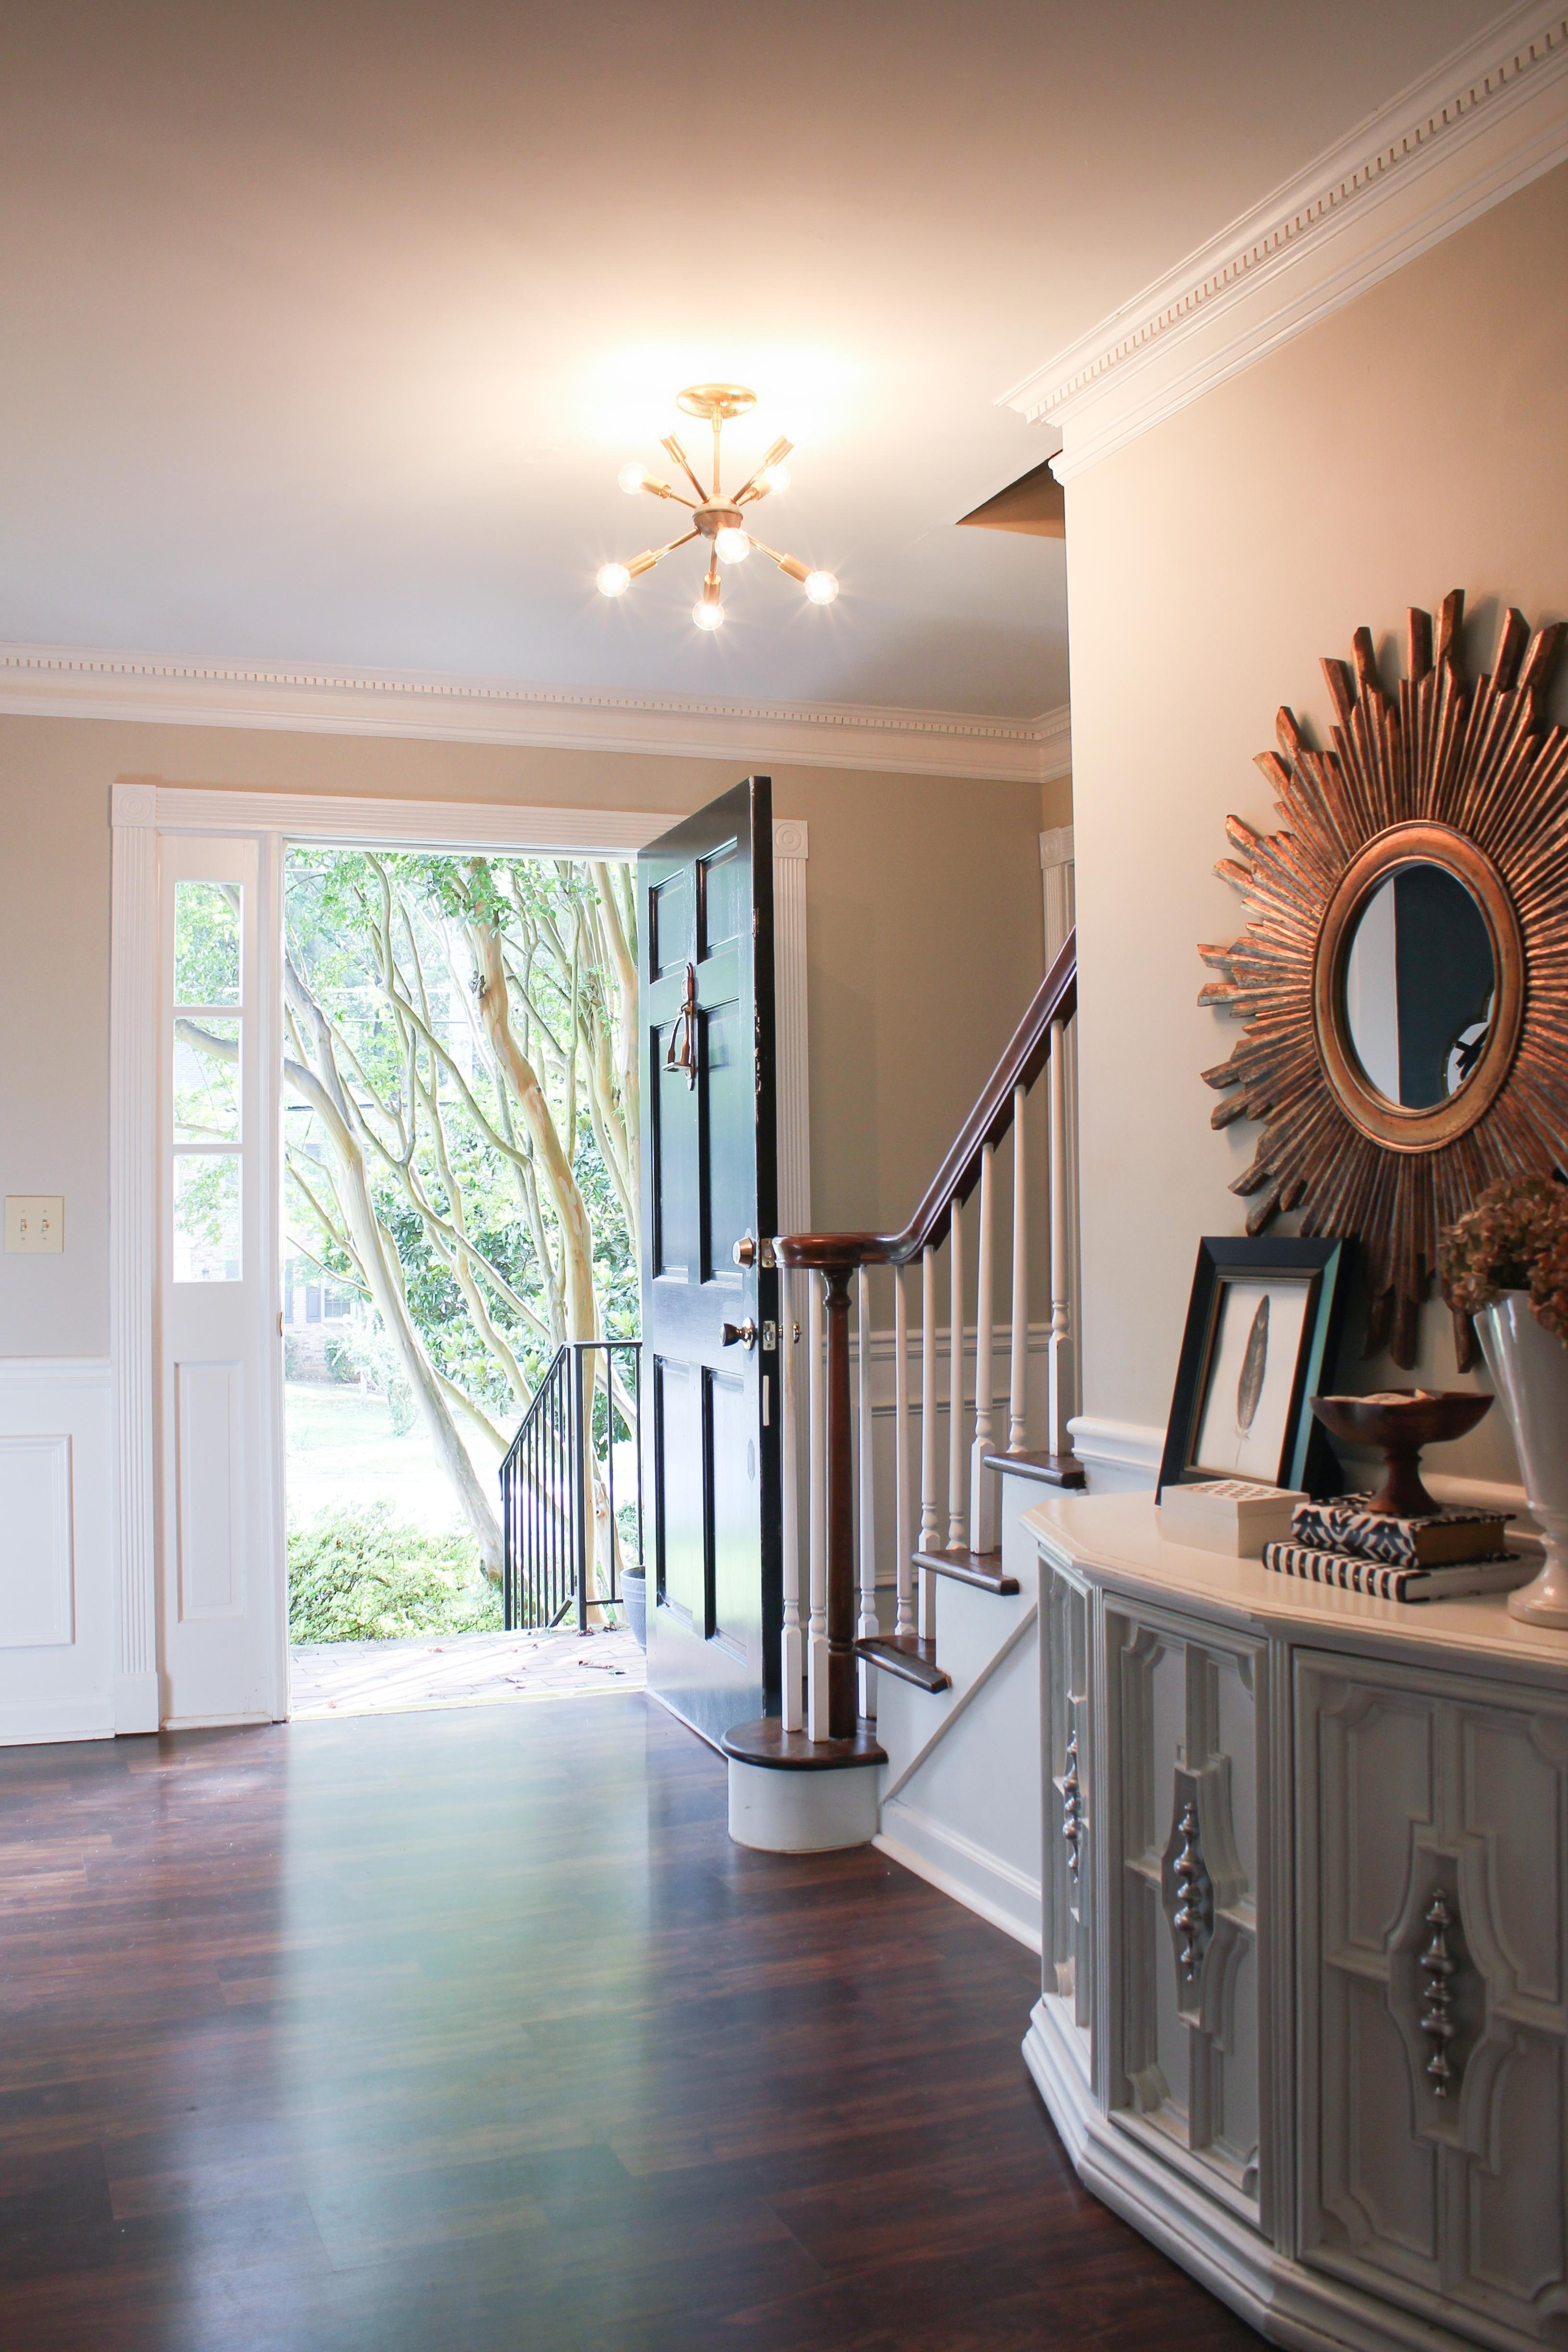 Best And Newest Mini Sputnik Chandeliers Regarding Accessories: Mid Century Style Lighting In Living Room Using Sputnik (View 10 of 15)